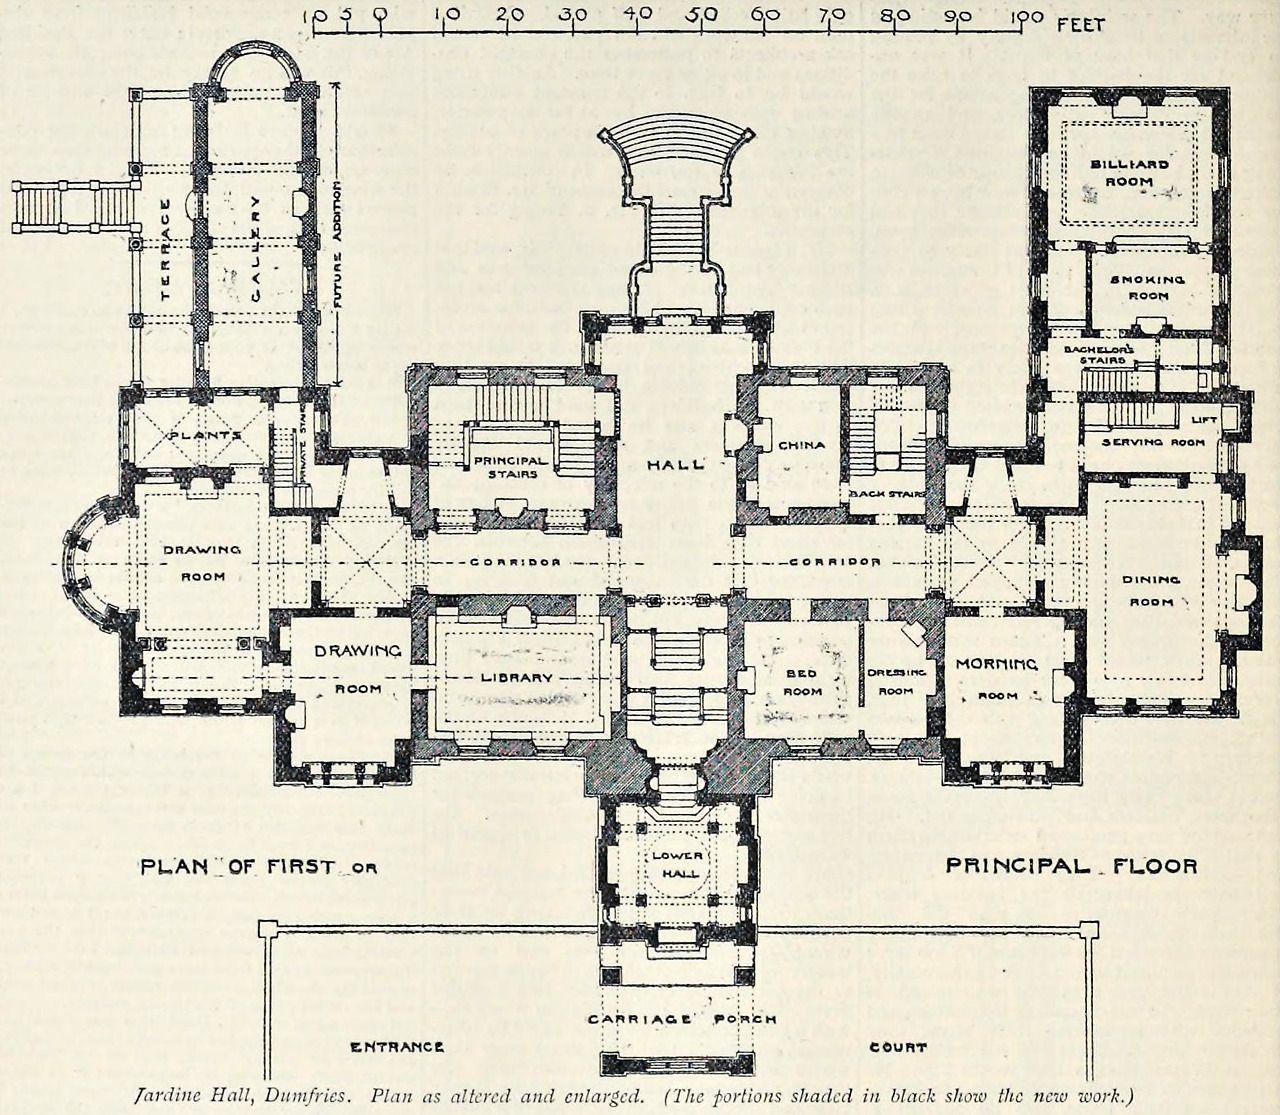 Jardine Apartments: Floor Plan Of The Extended Jardine Hall, Dumfries